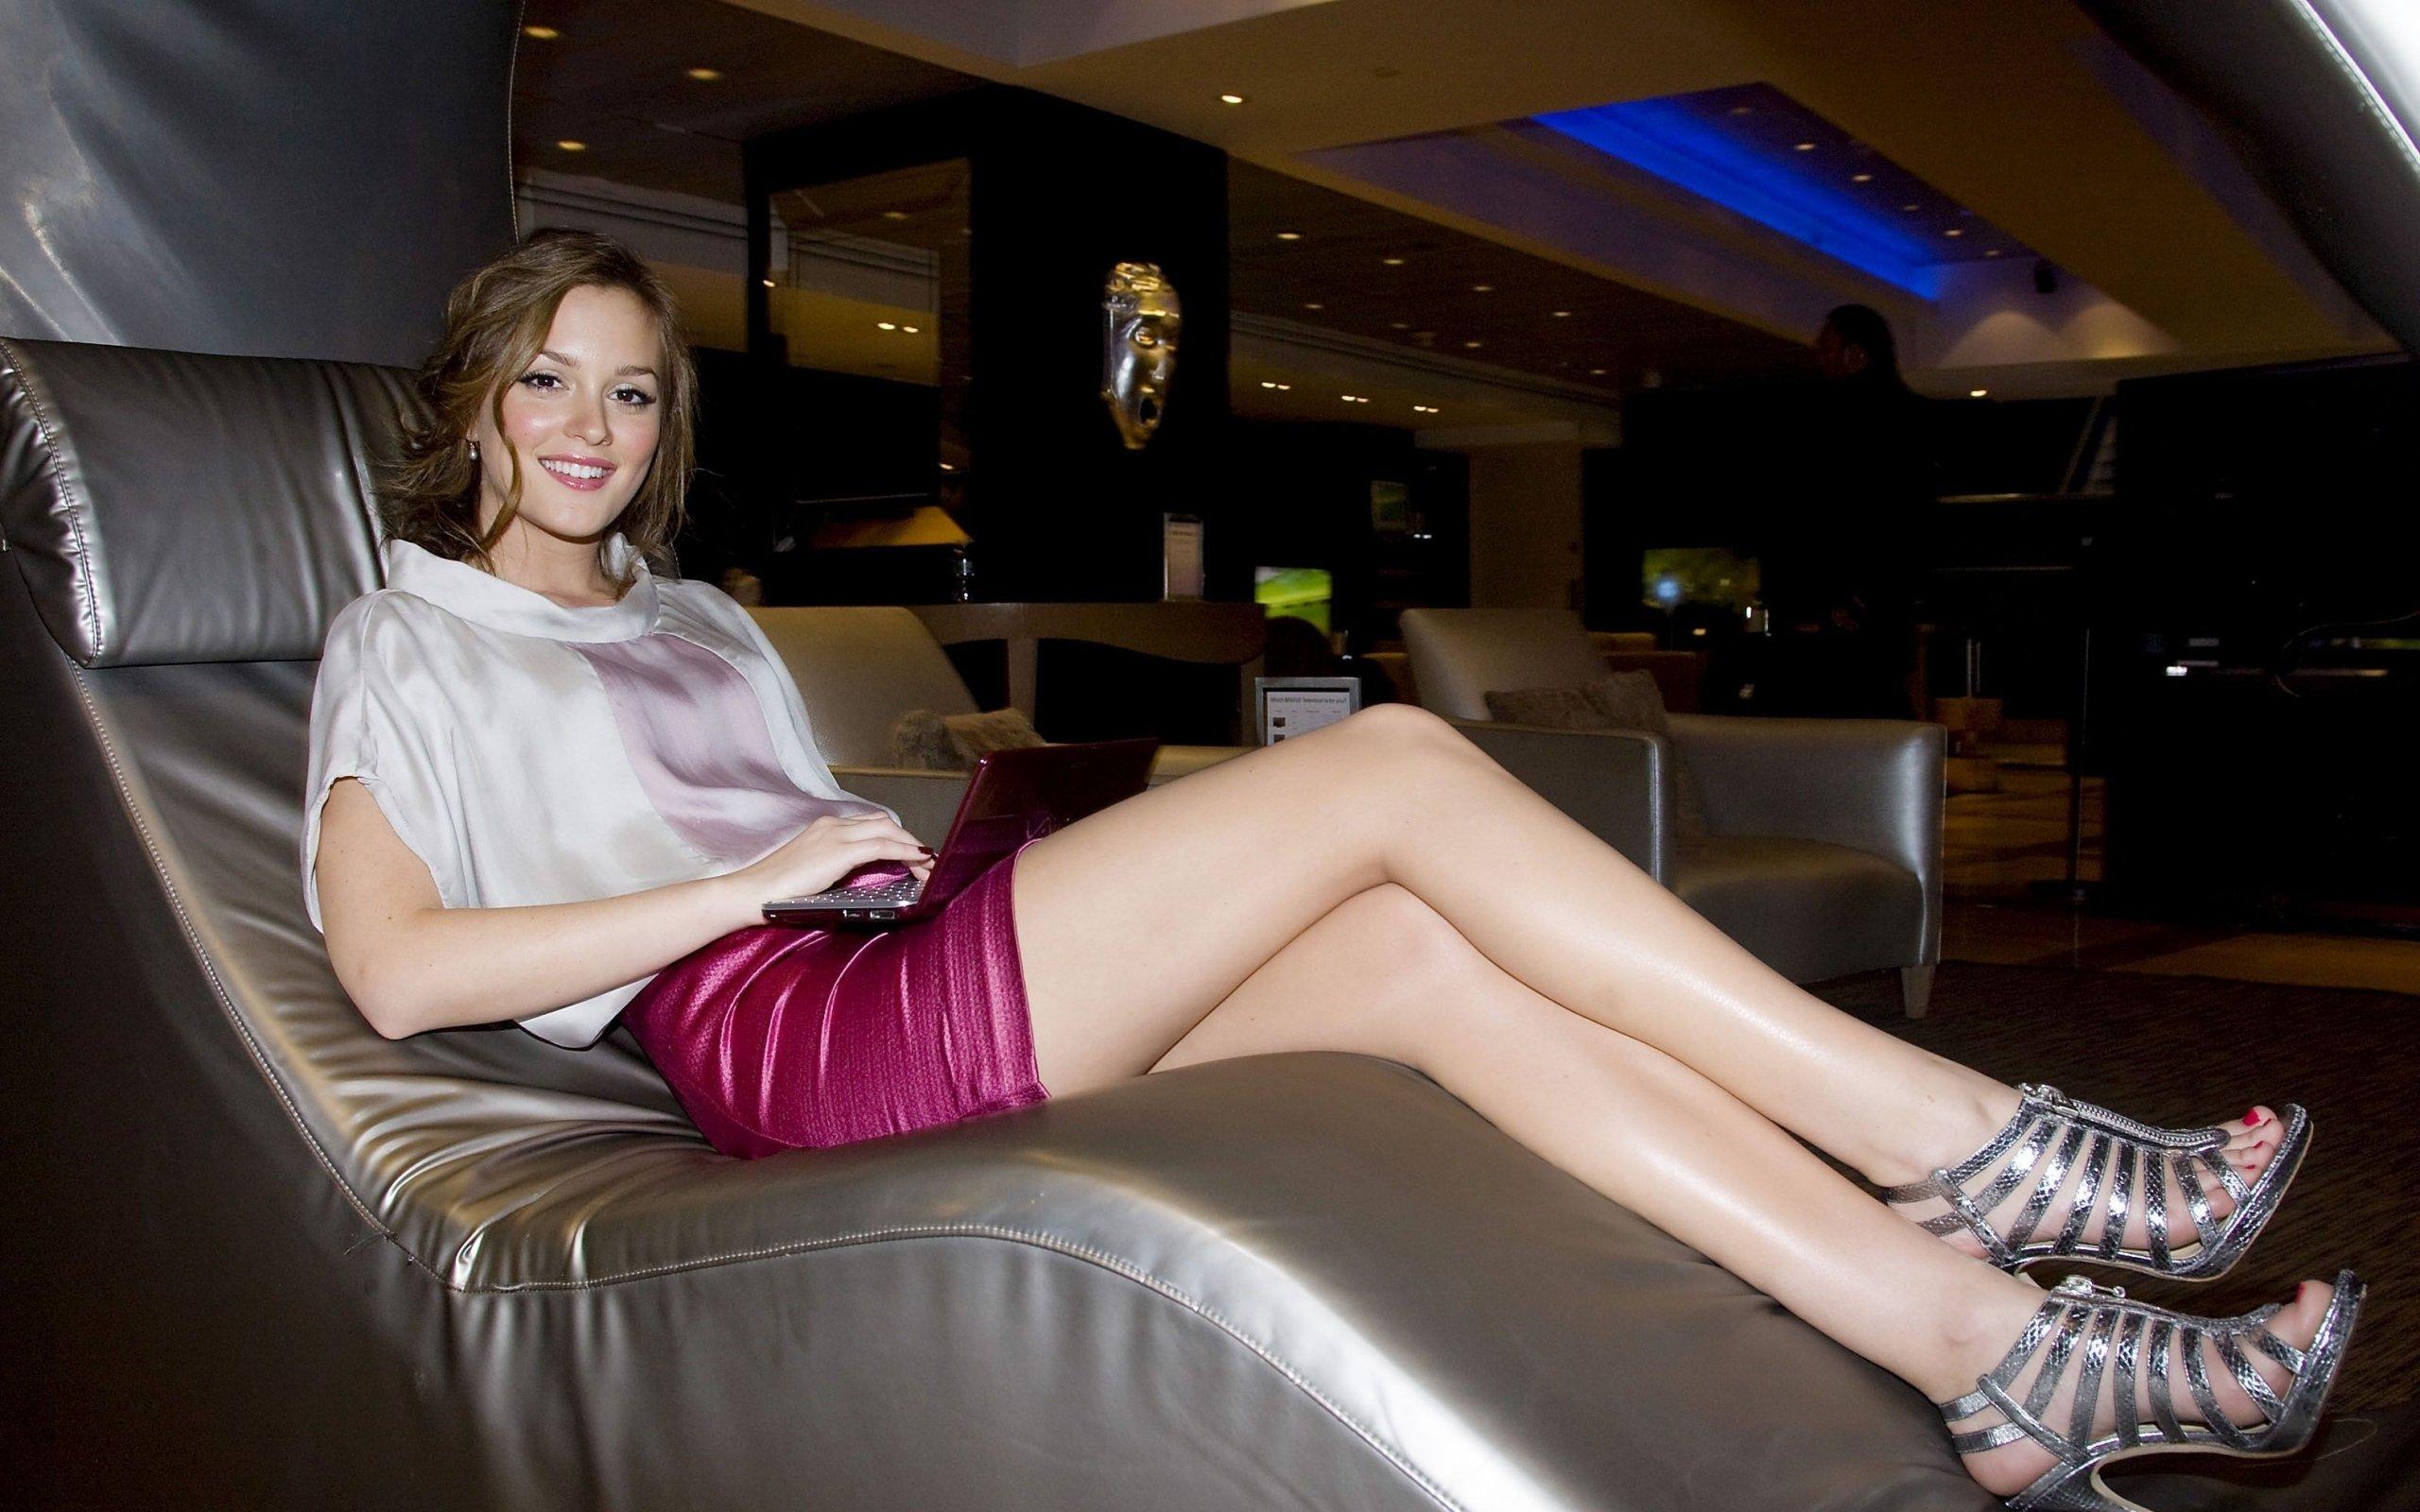 laptops high heels smiling long Wallpaper Wallpapers Download 2560x1600